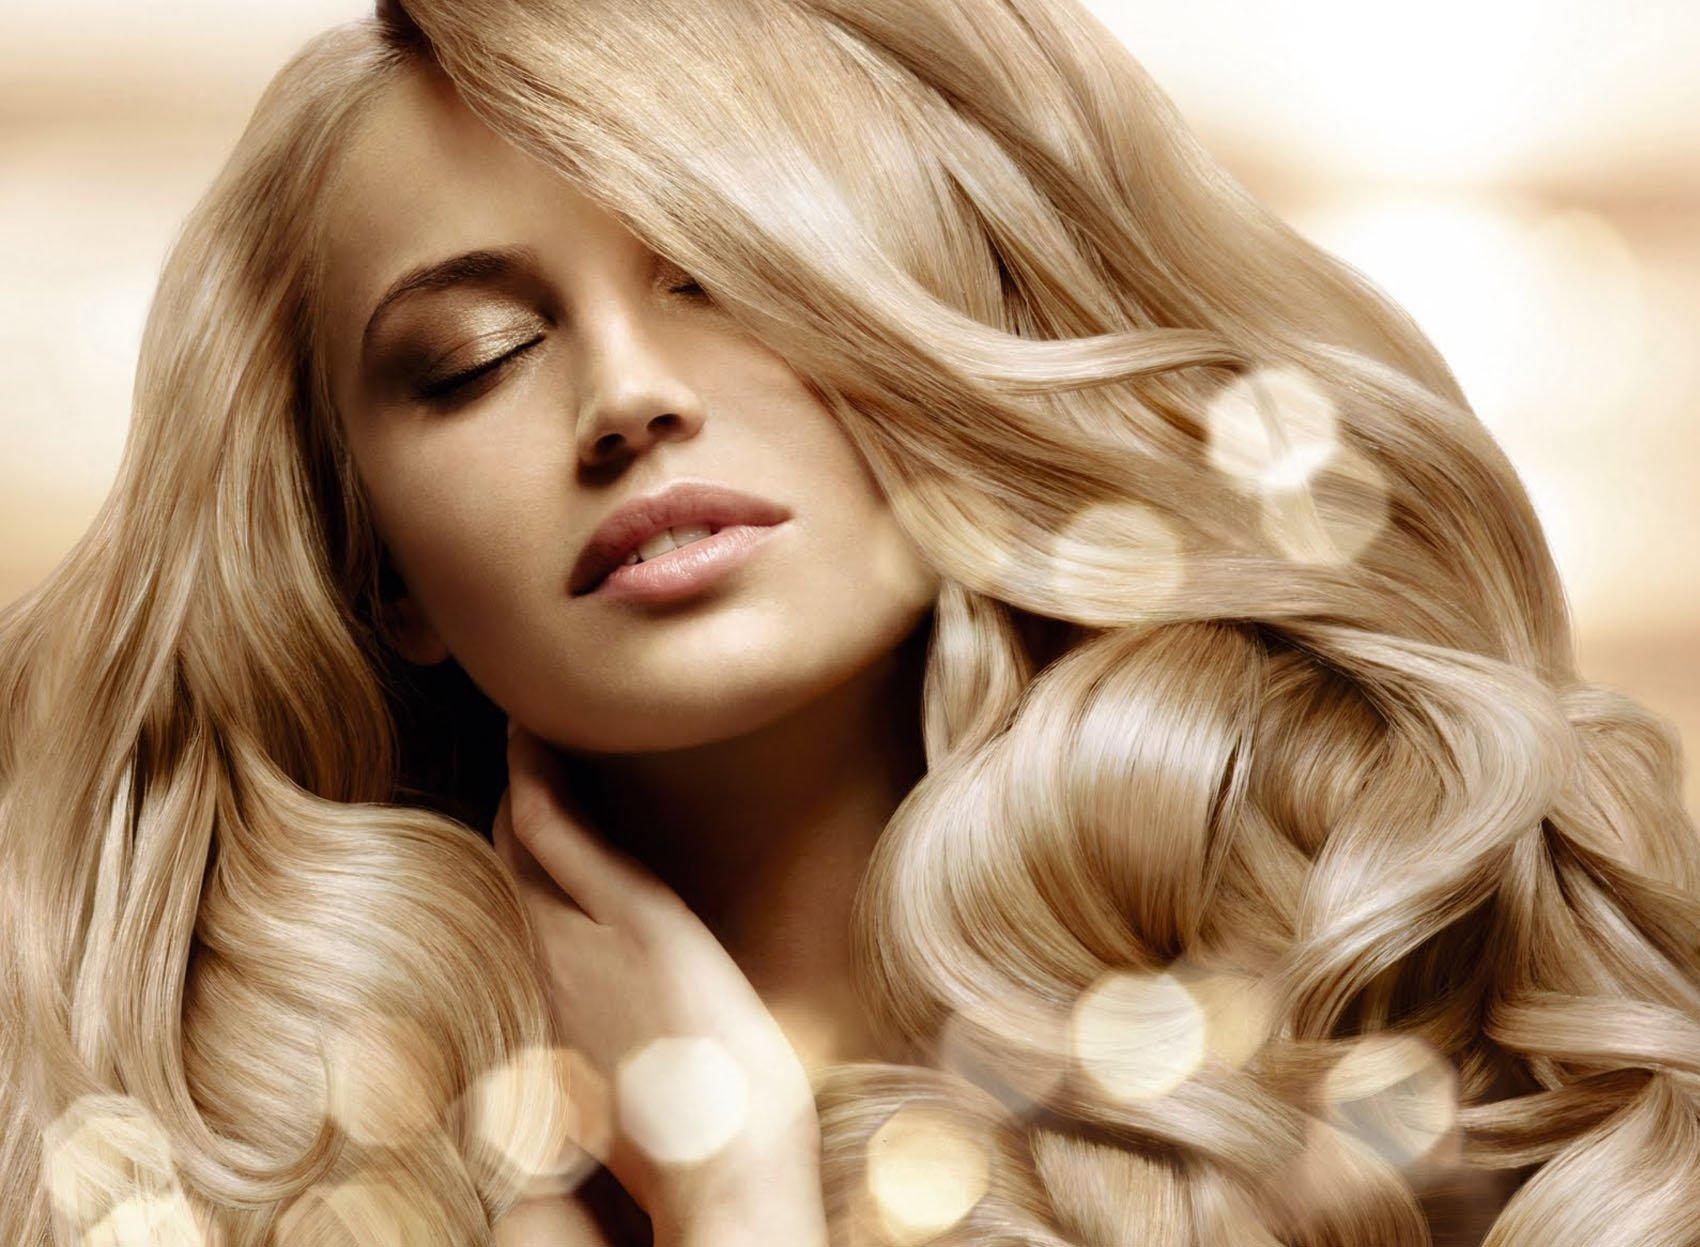 capelli biondi di donna